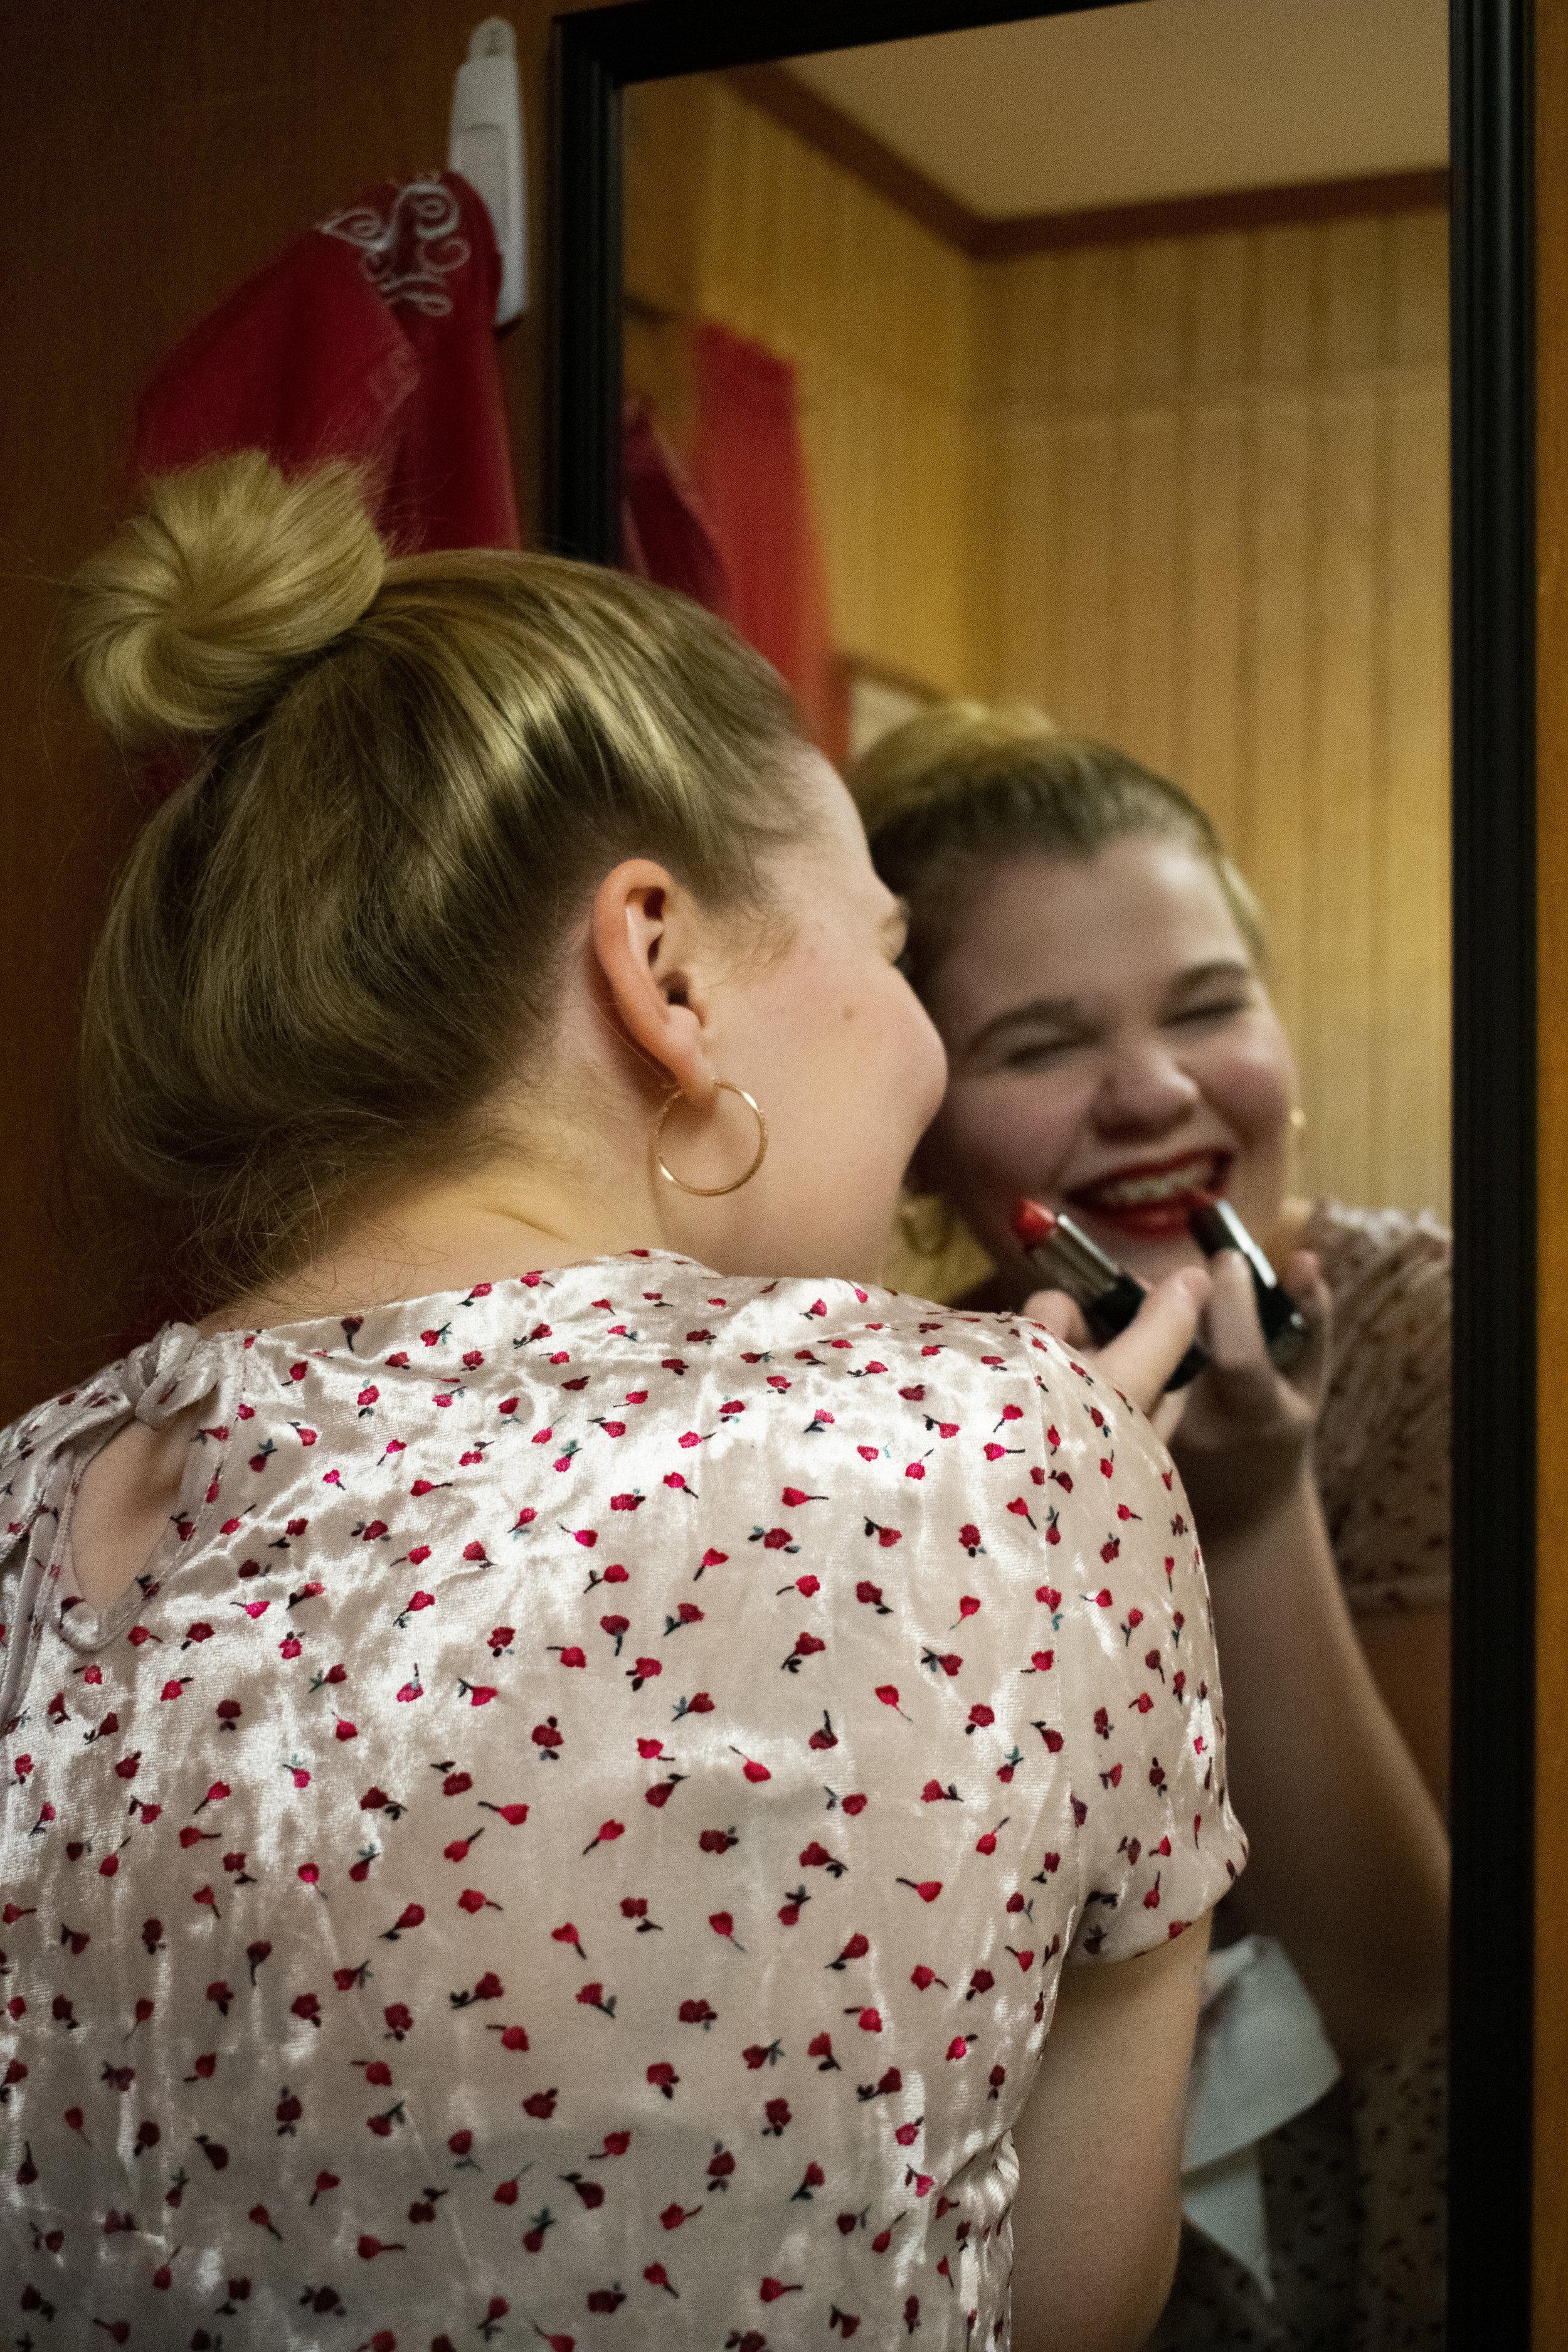 Freshman Emily Hansen wants to feel festive so she carefully applies red lipstick.